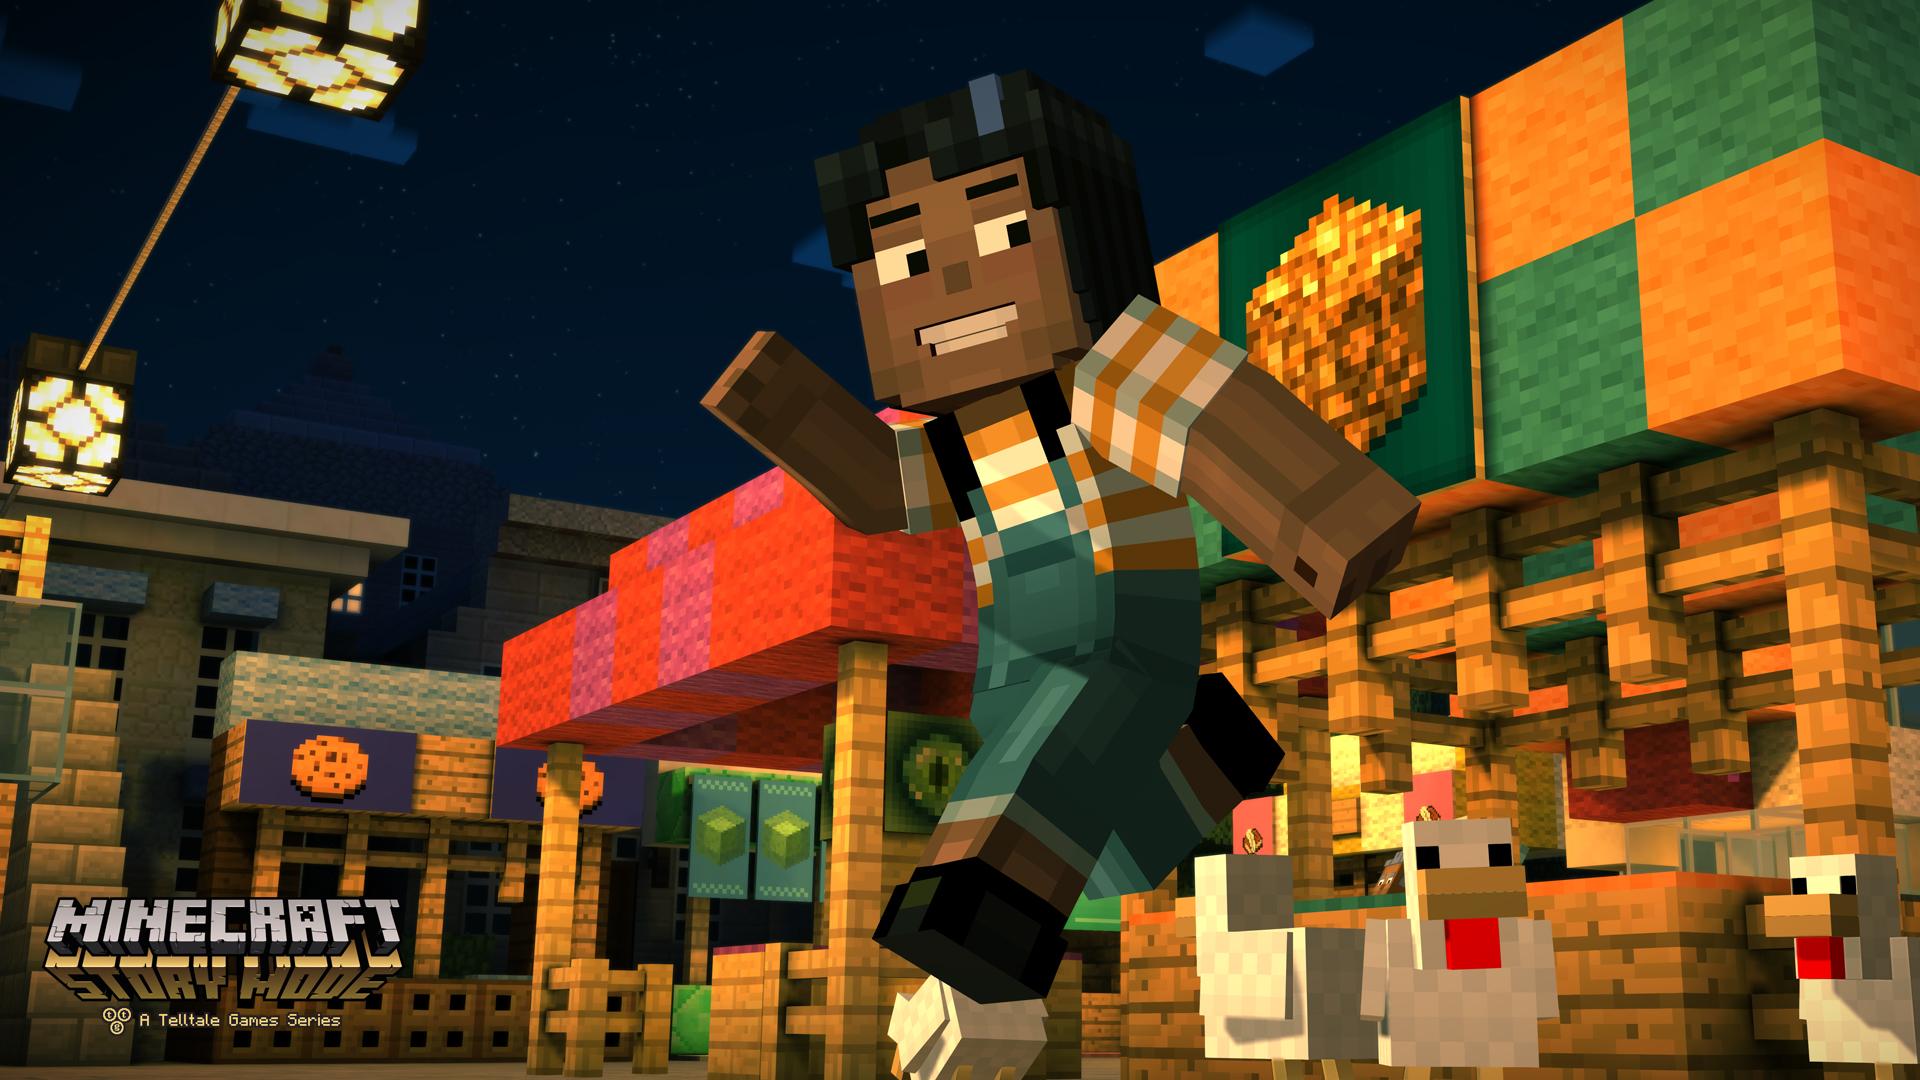 Minecraft: Story Mode скачать v1.37 (Все эпизоды) на Android